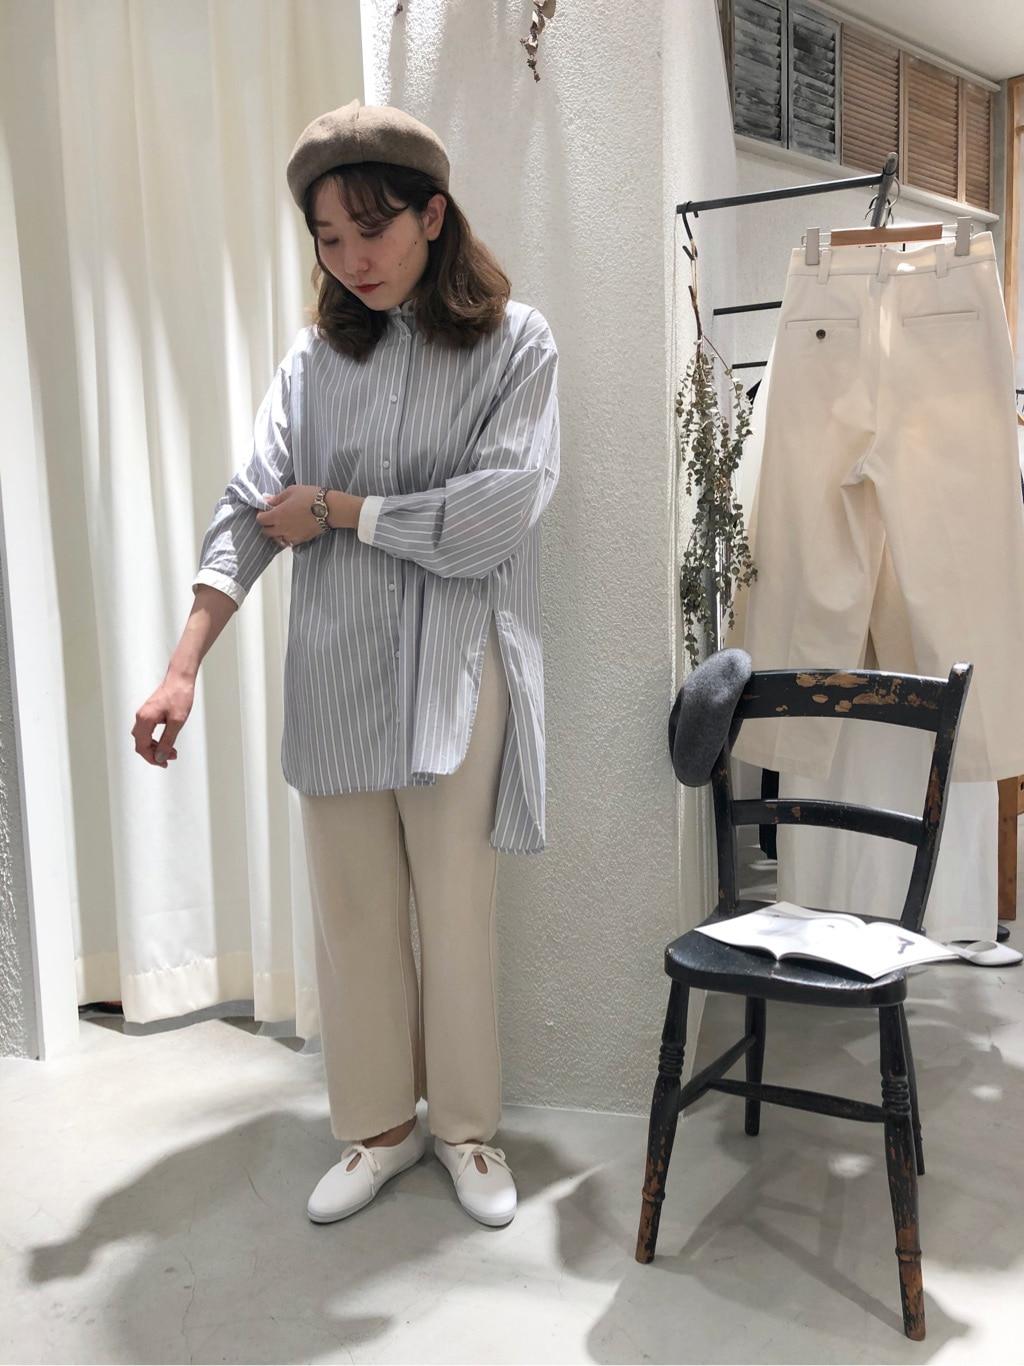 chambre de charme キラリナ京王吉祥寺 身長:163cm 2020.08.25